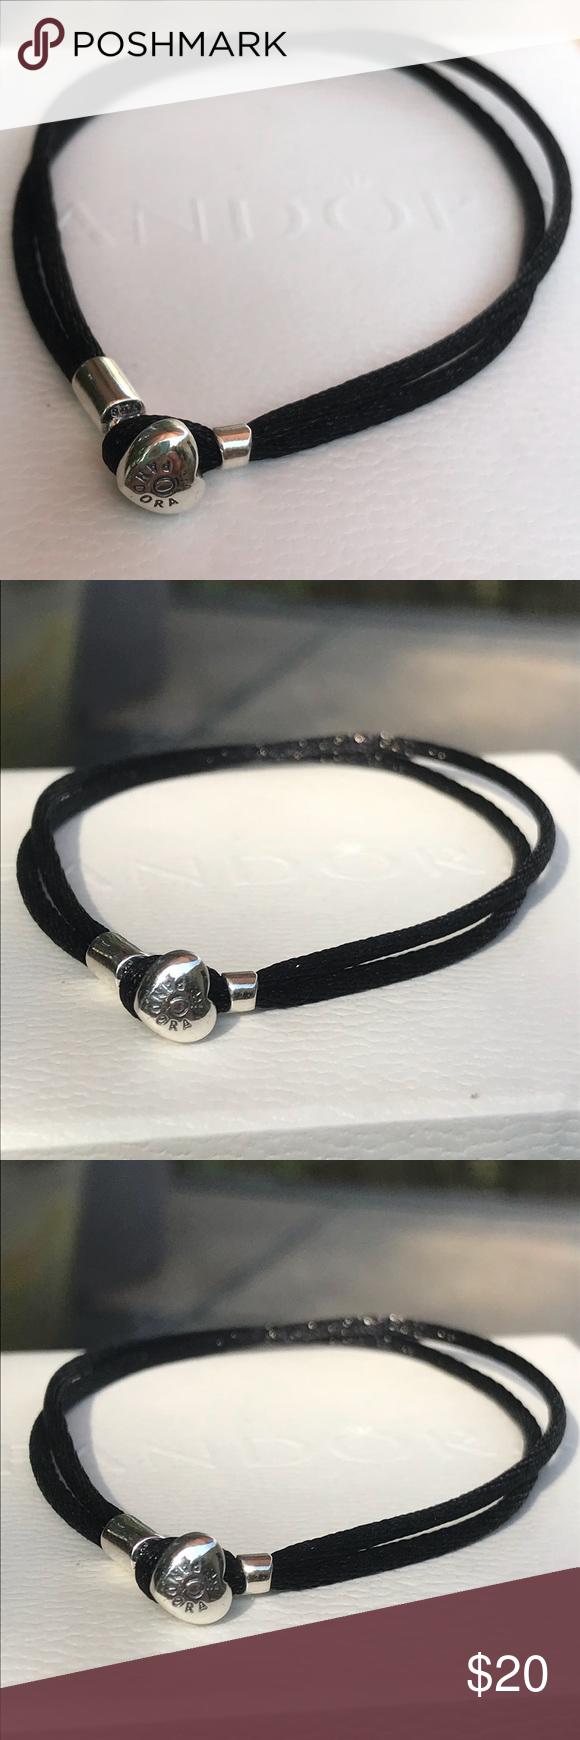 31a5407bd Pandora Moments Black Cord Bracelet Authentic Fabric Jewelry Bracelets